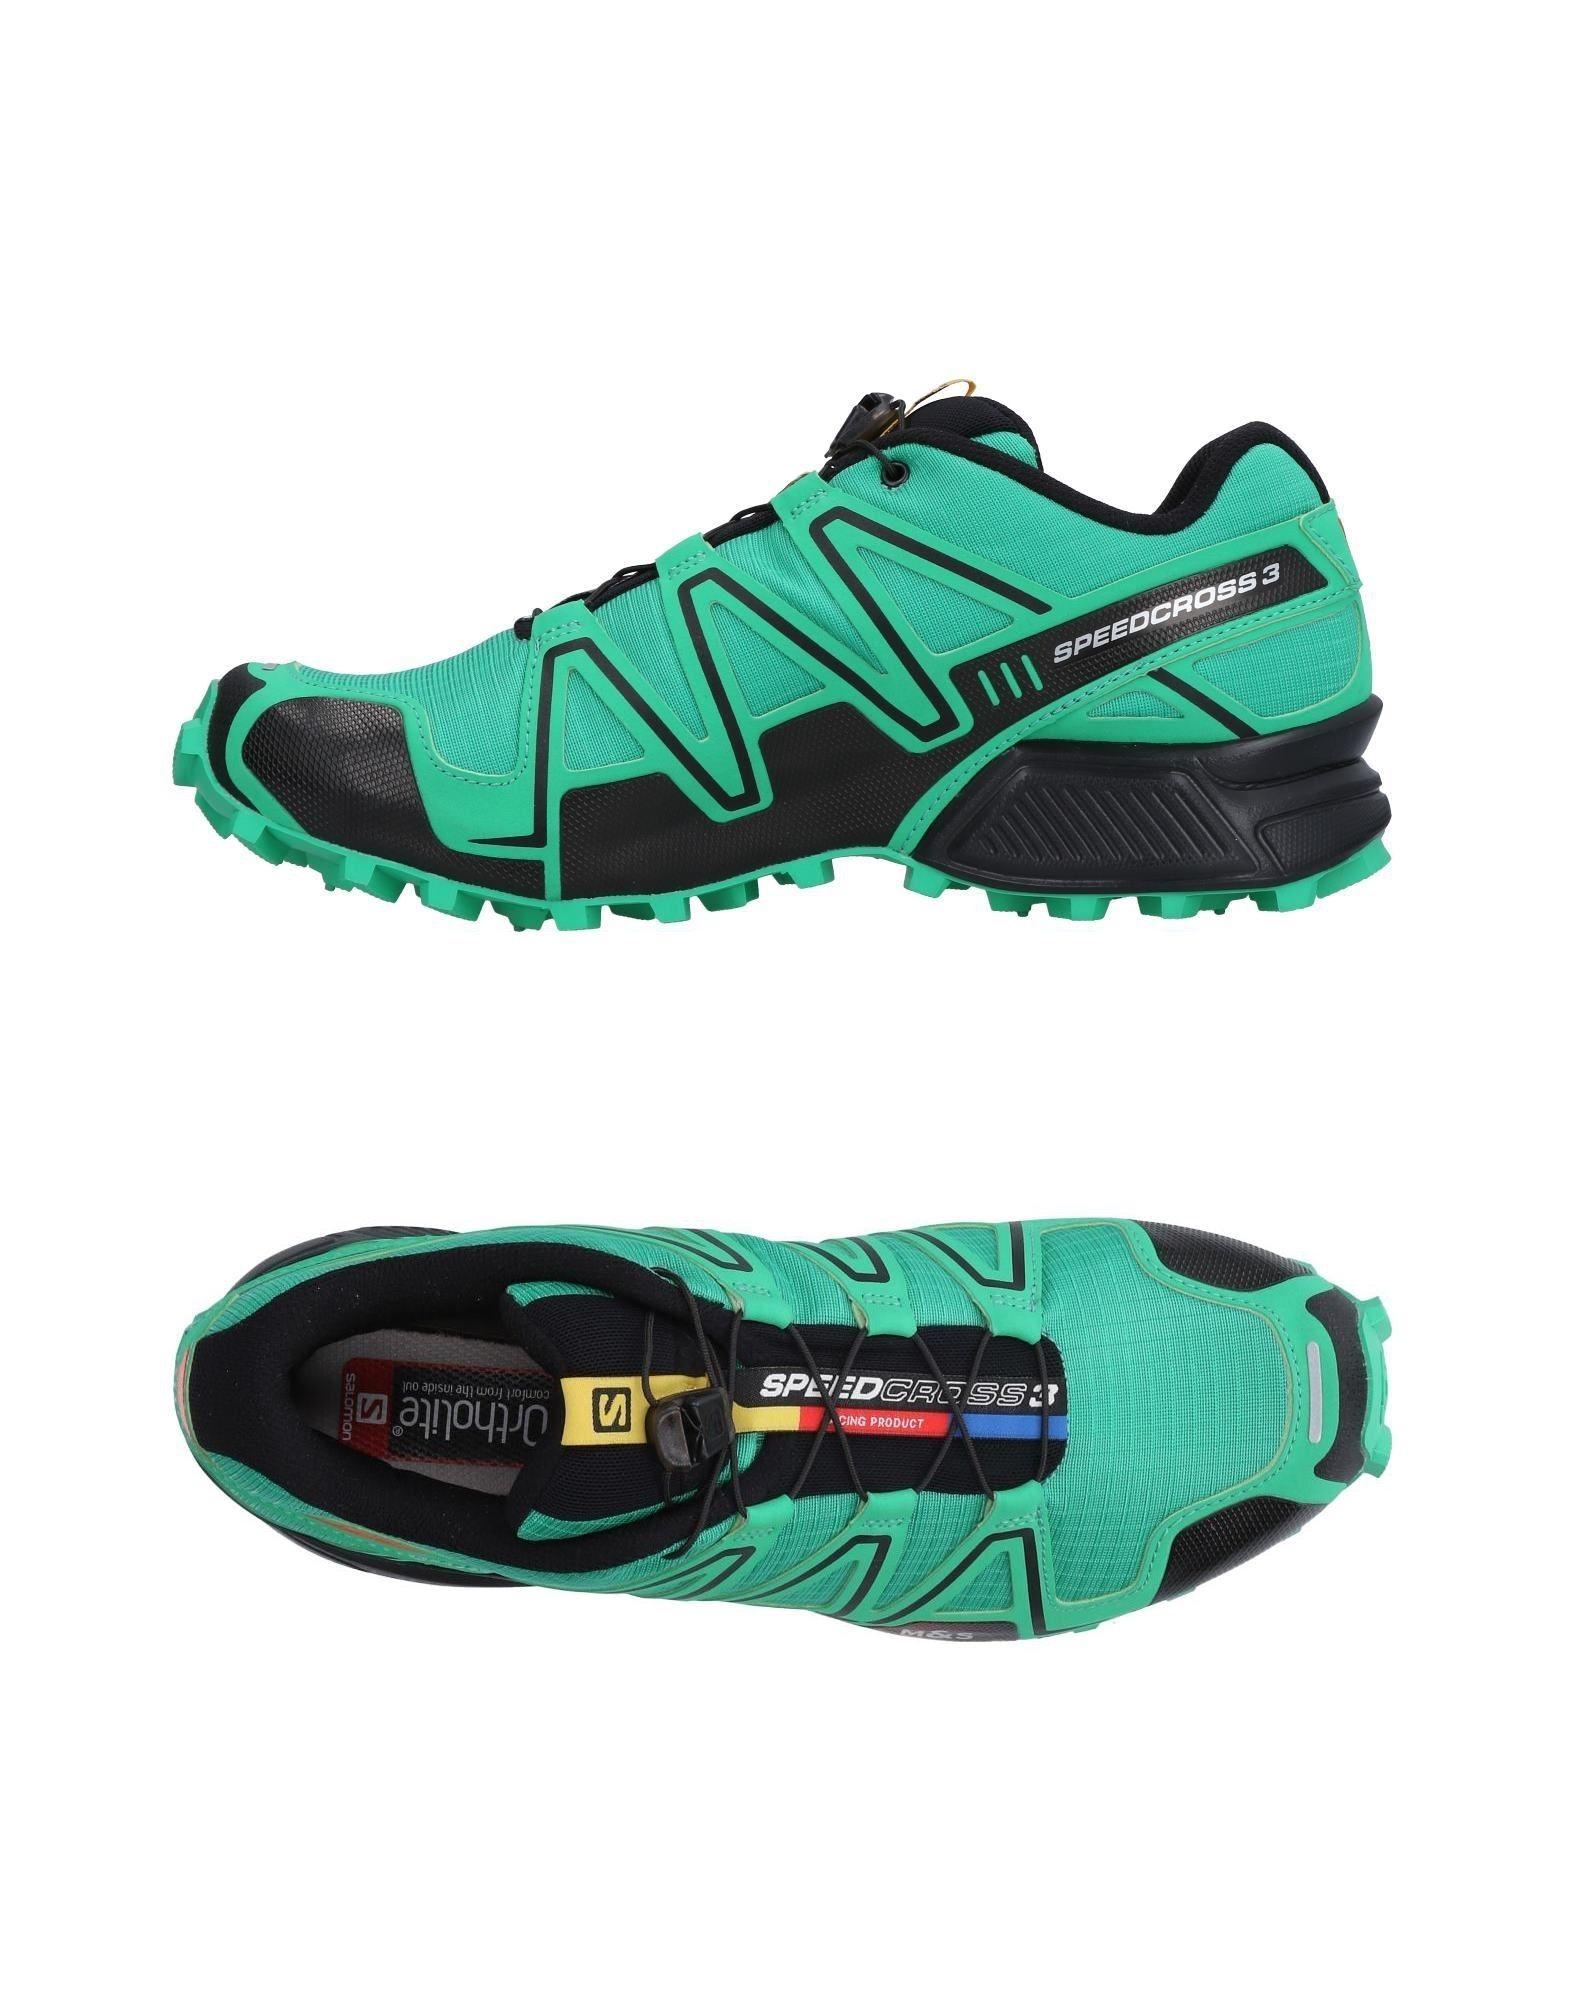 SALOMON Sneakers in Green